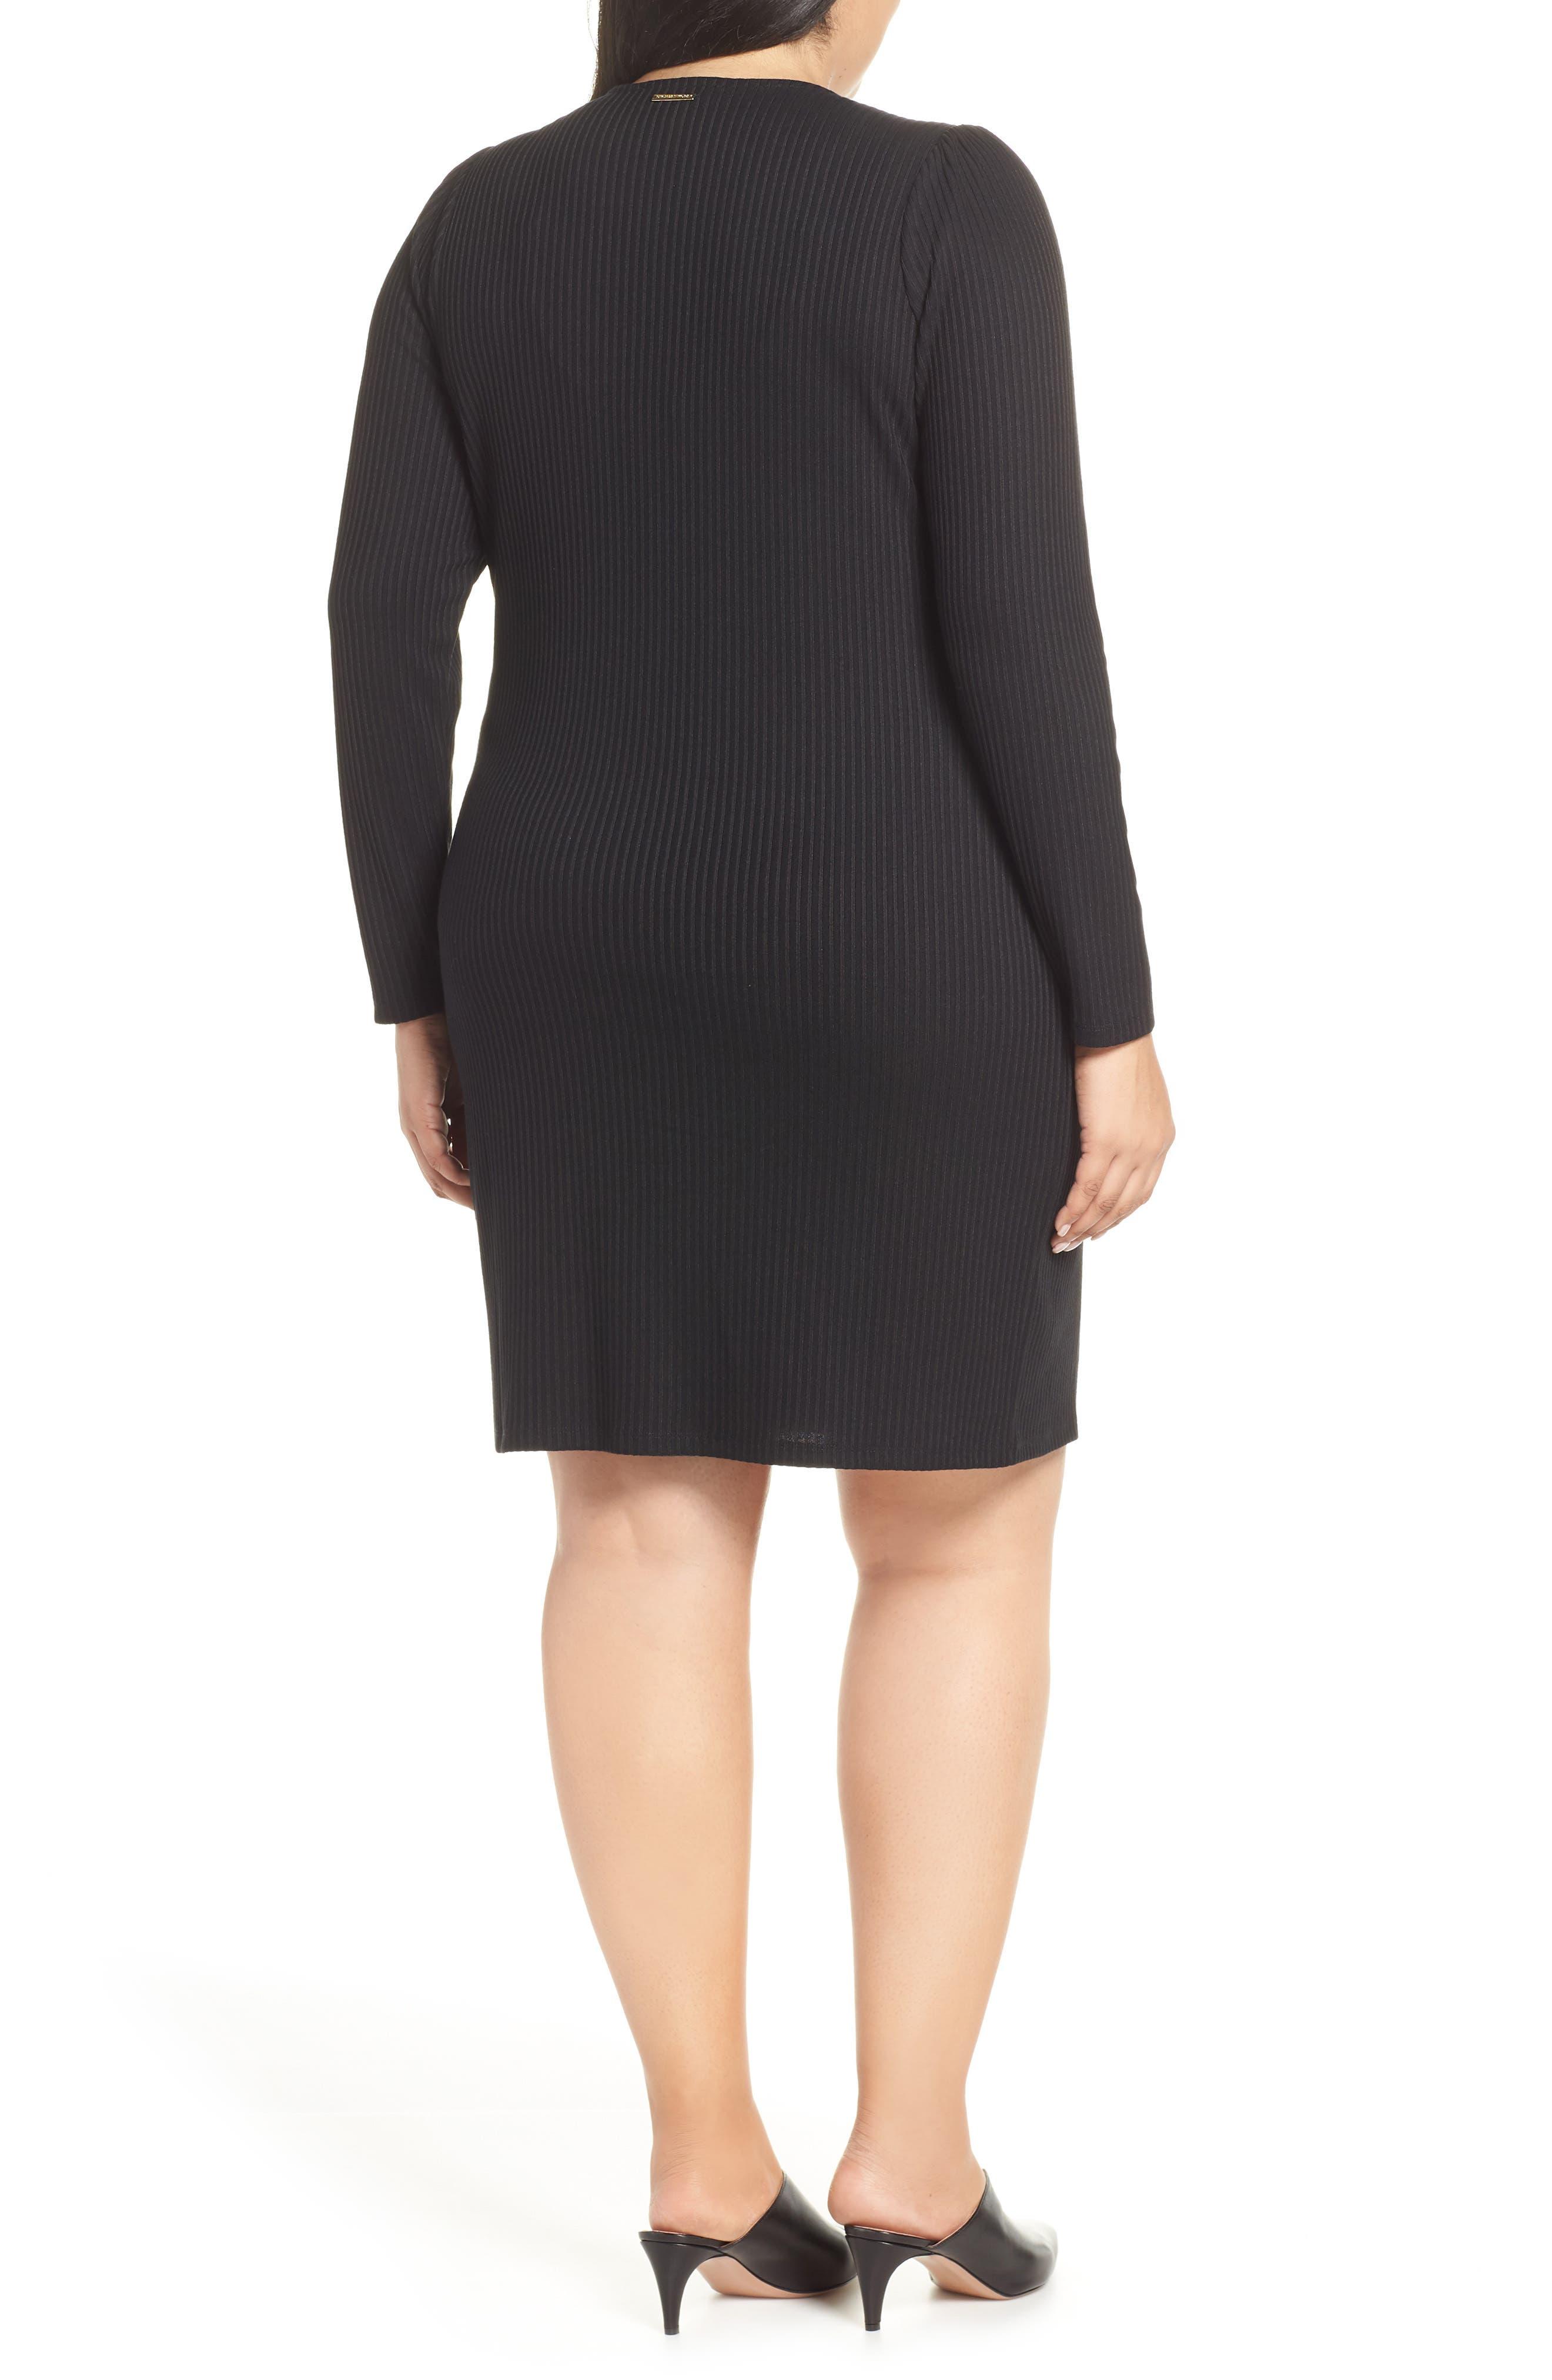 MICHAEL MICHAEL KORS, Chain Lace-Up V-Neck Sweater Dress, Alternate thumbnail 2, color, 001